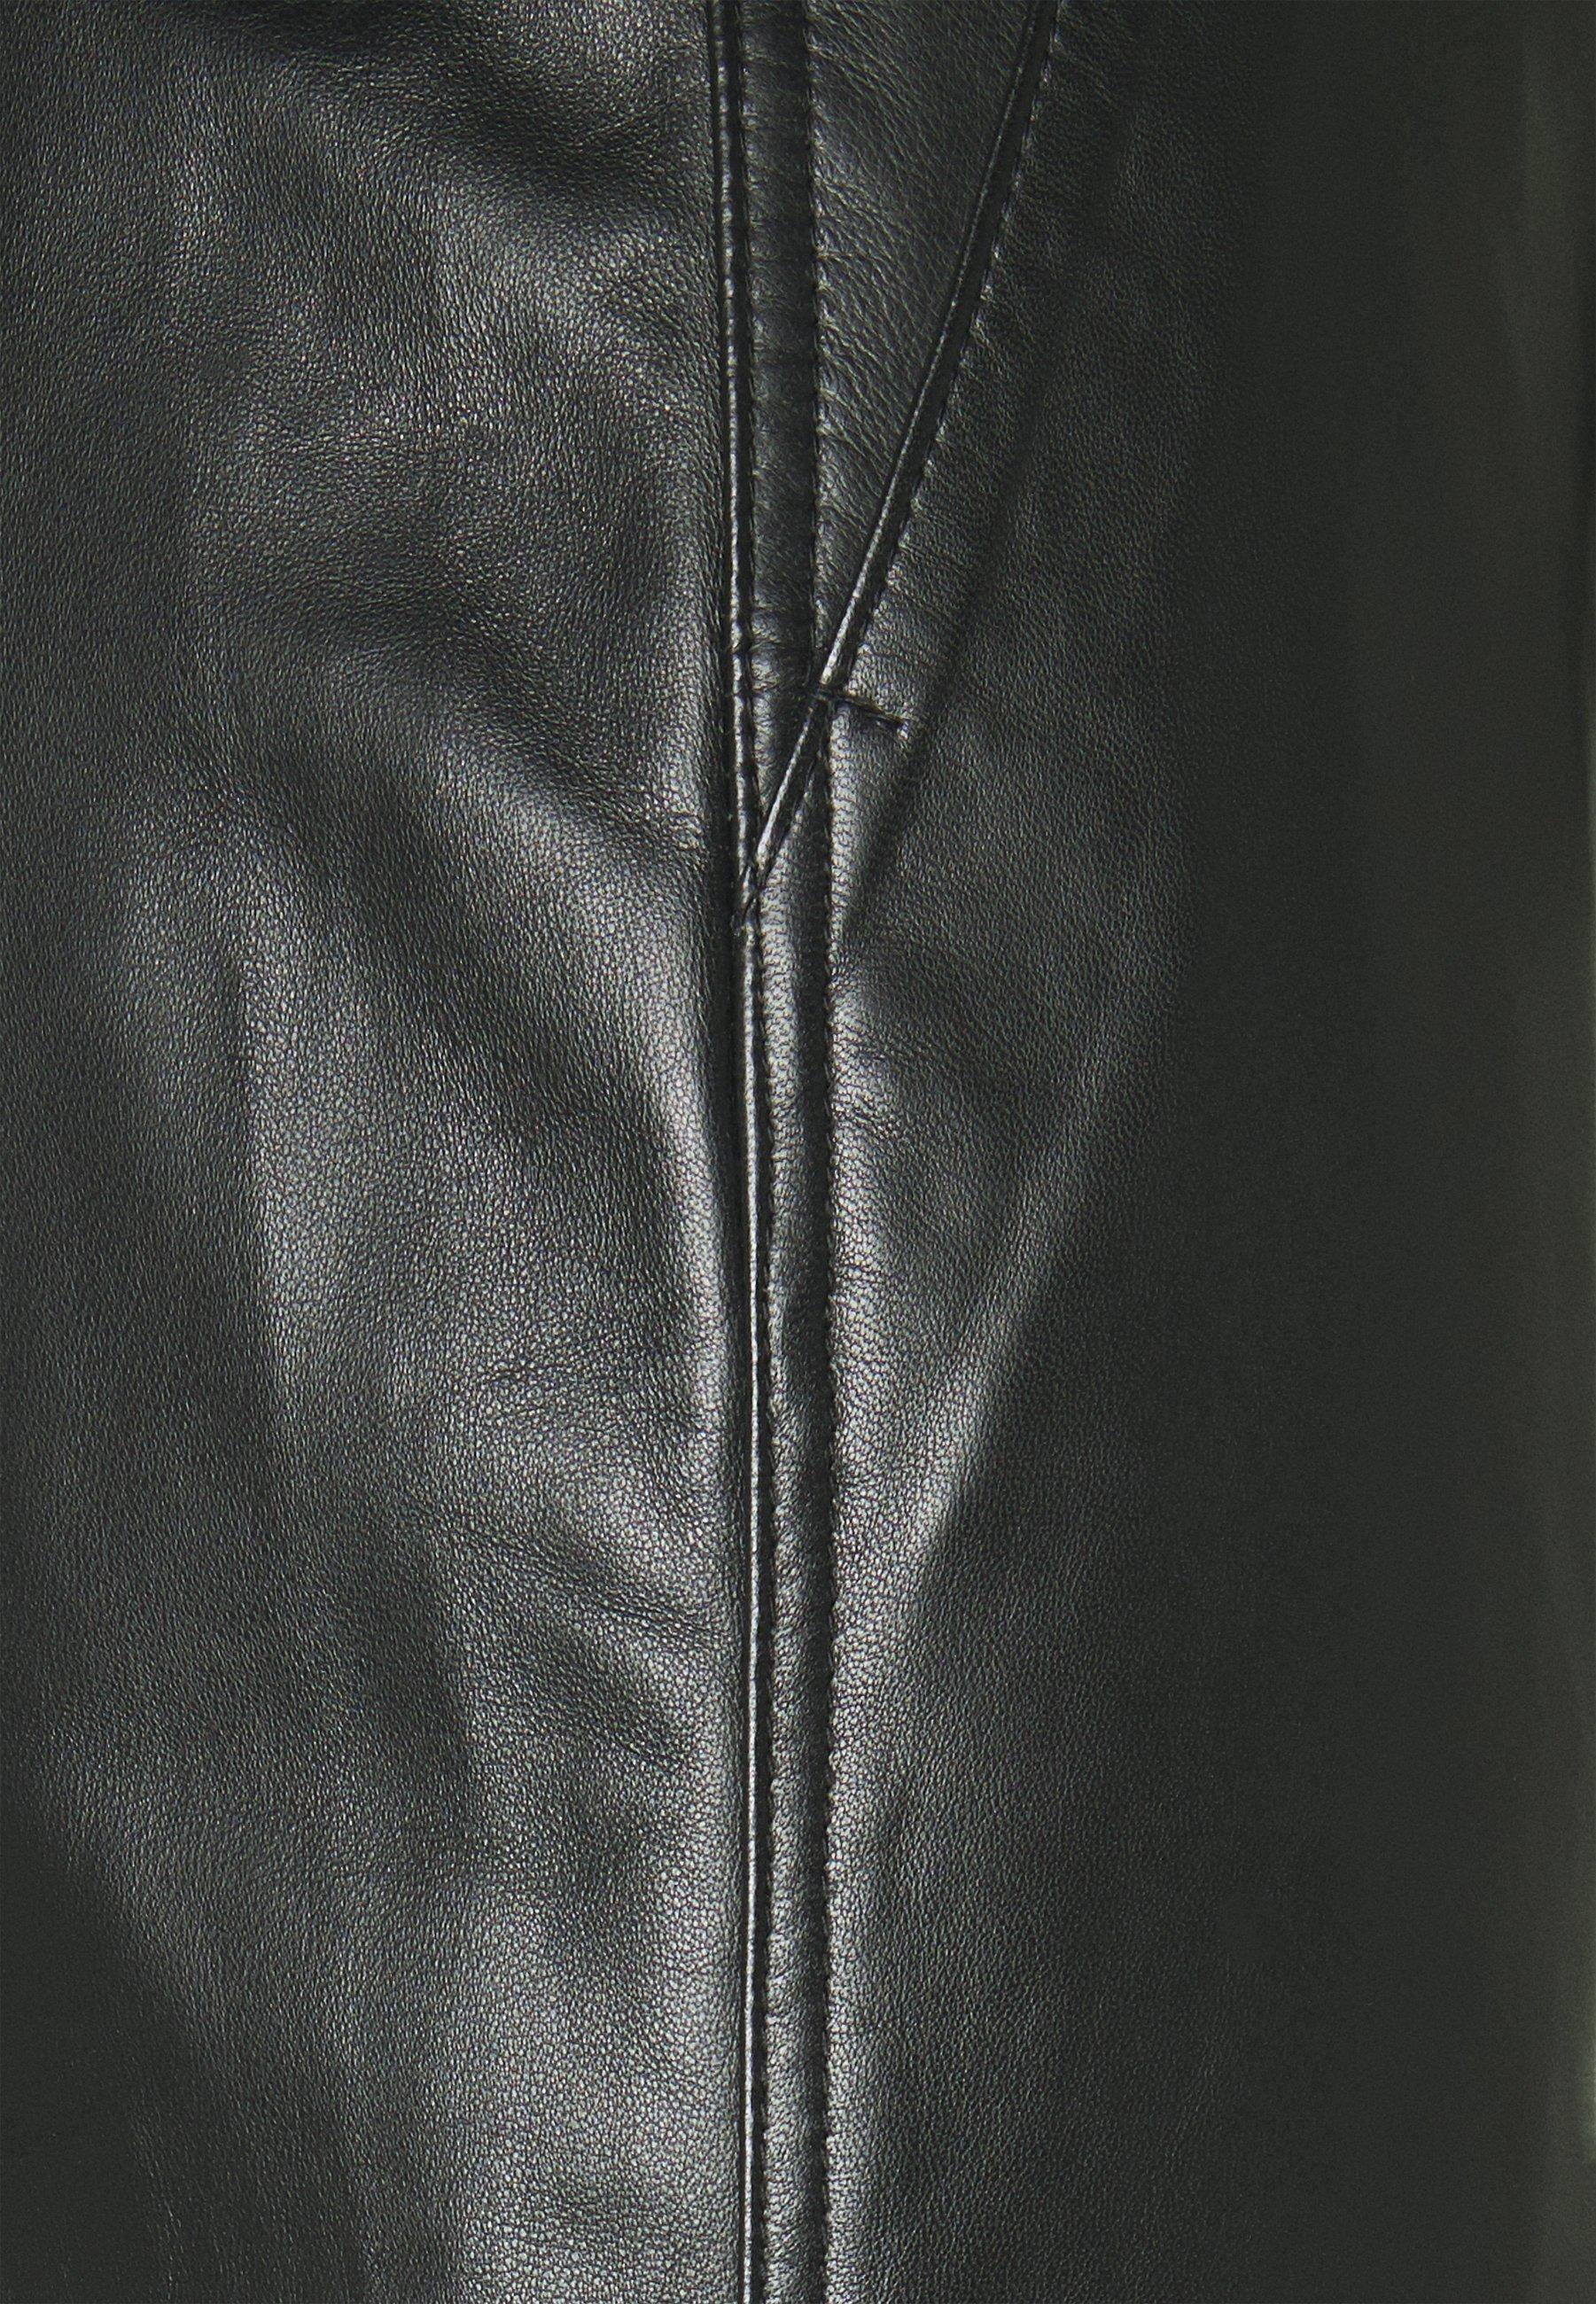 Damen INDIE TROUSERS - Lederhose